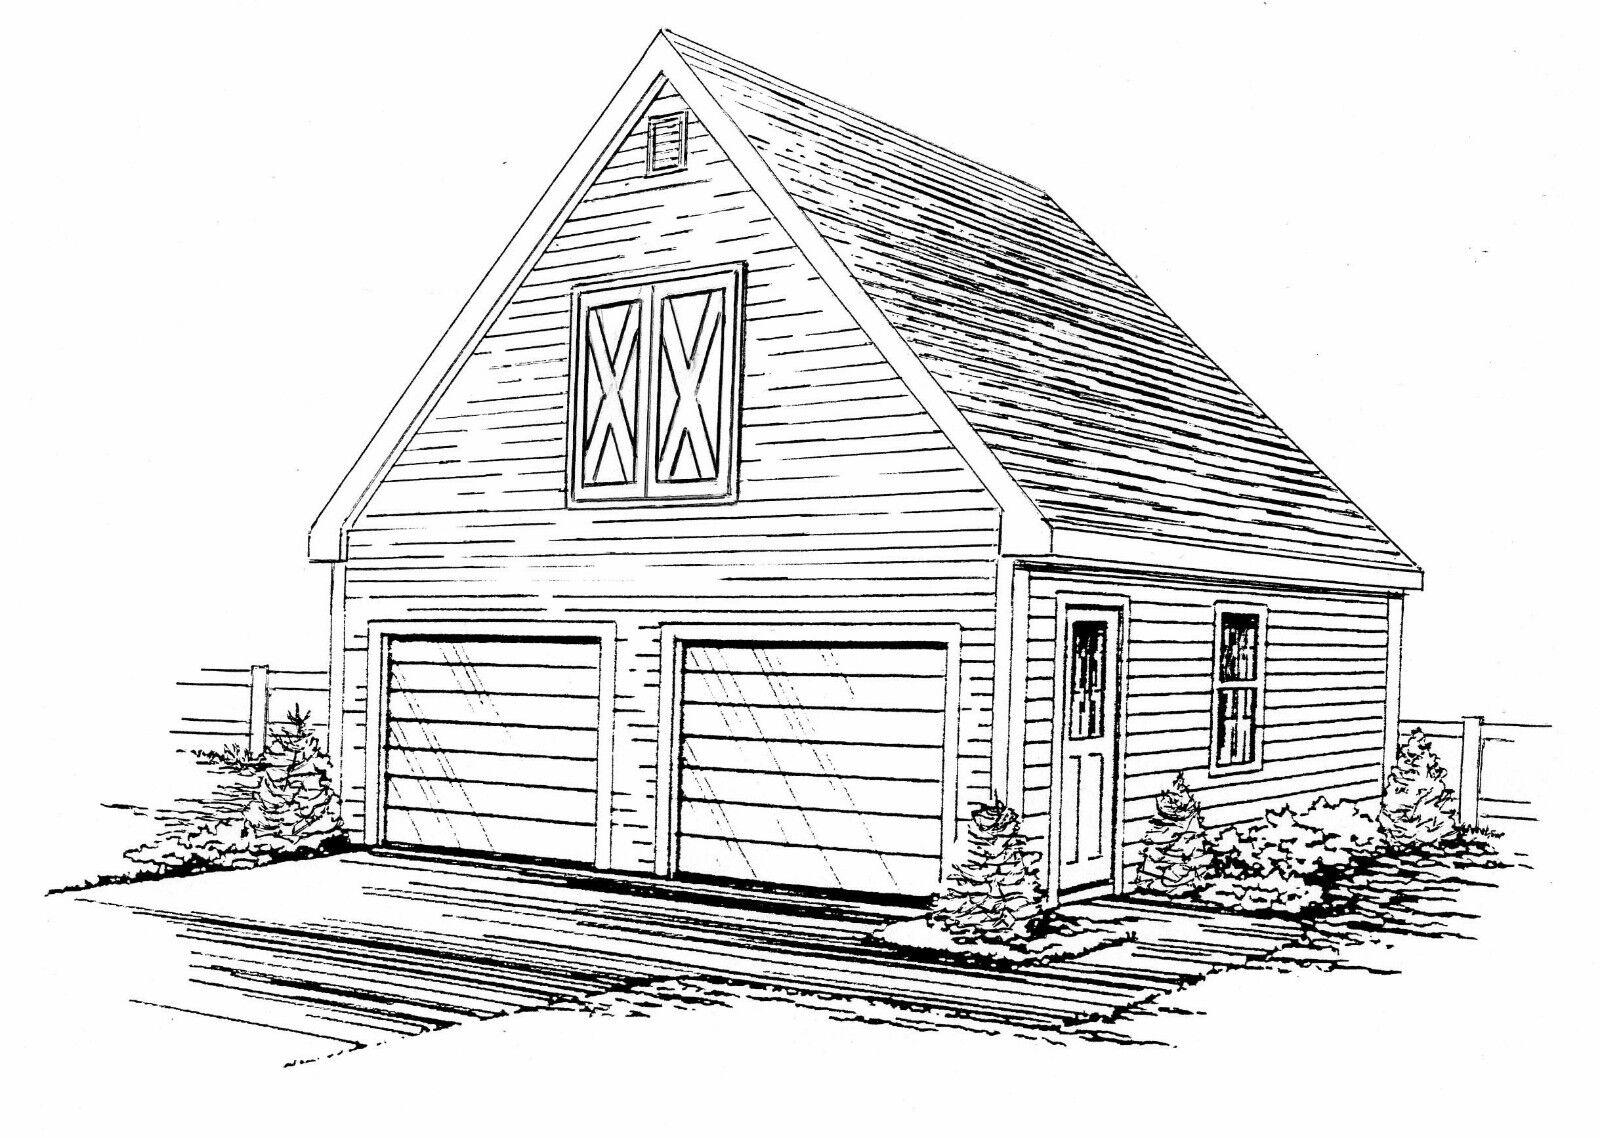 24 x 24 2 Car FG   RD Garage Building Blauprint Plans with pull dn stair to Loft